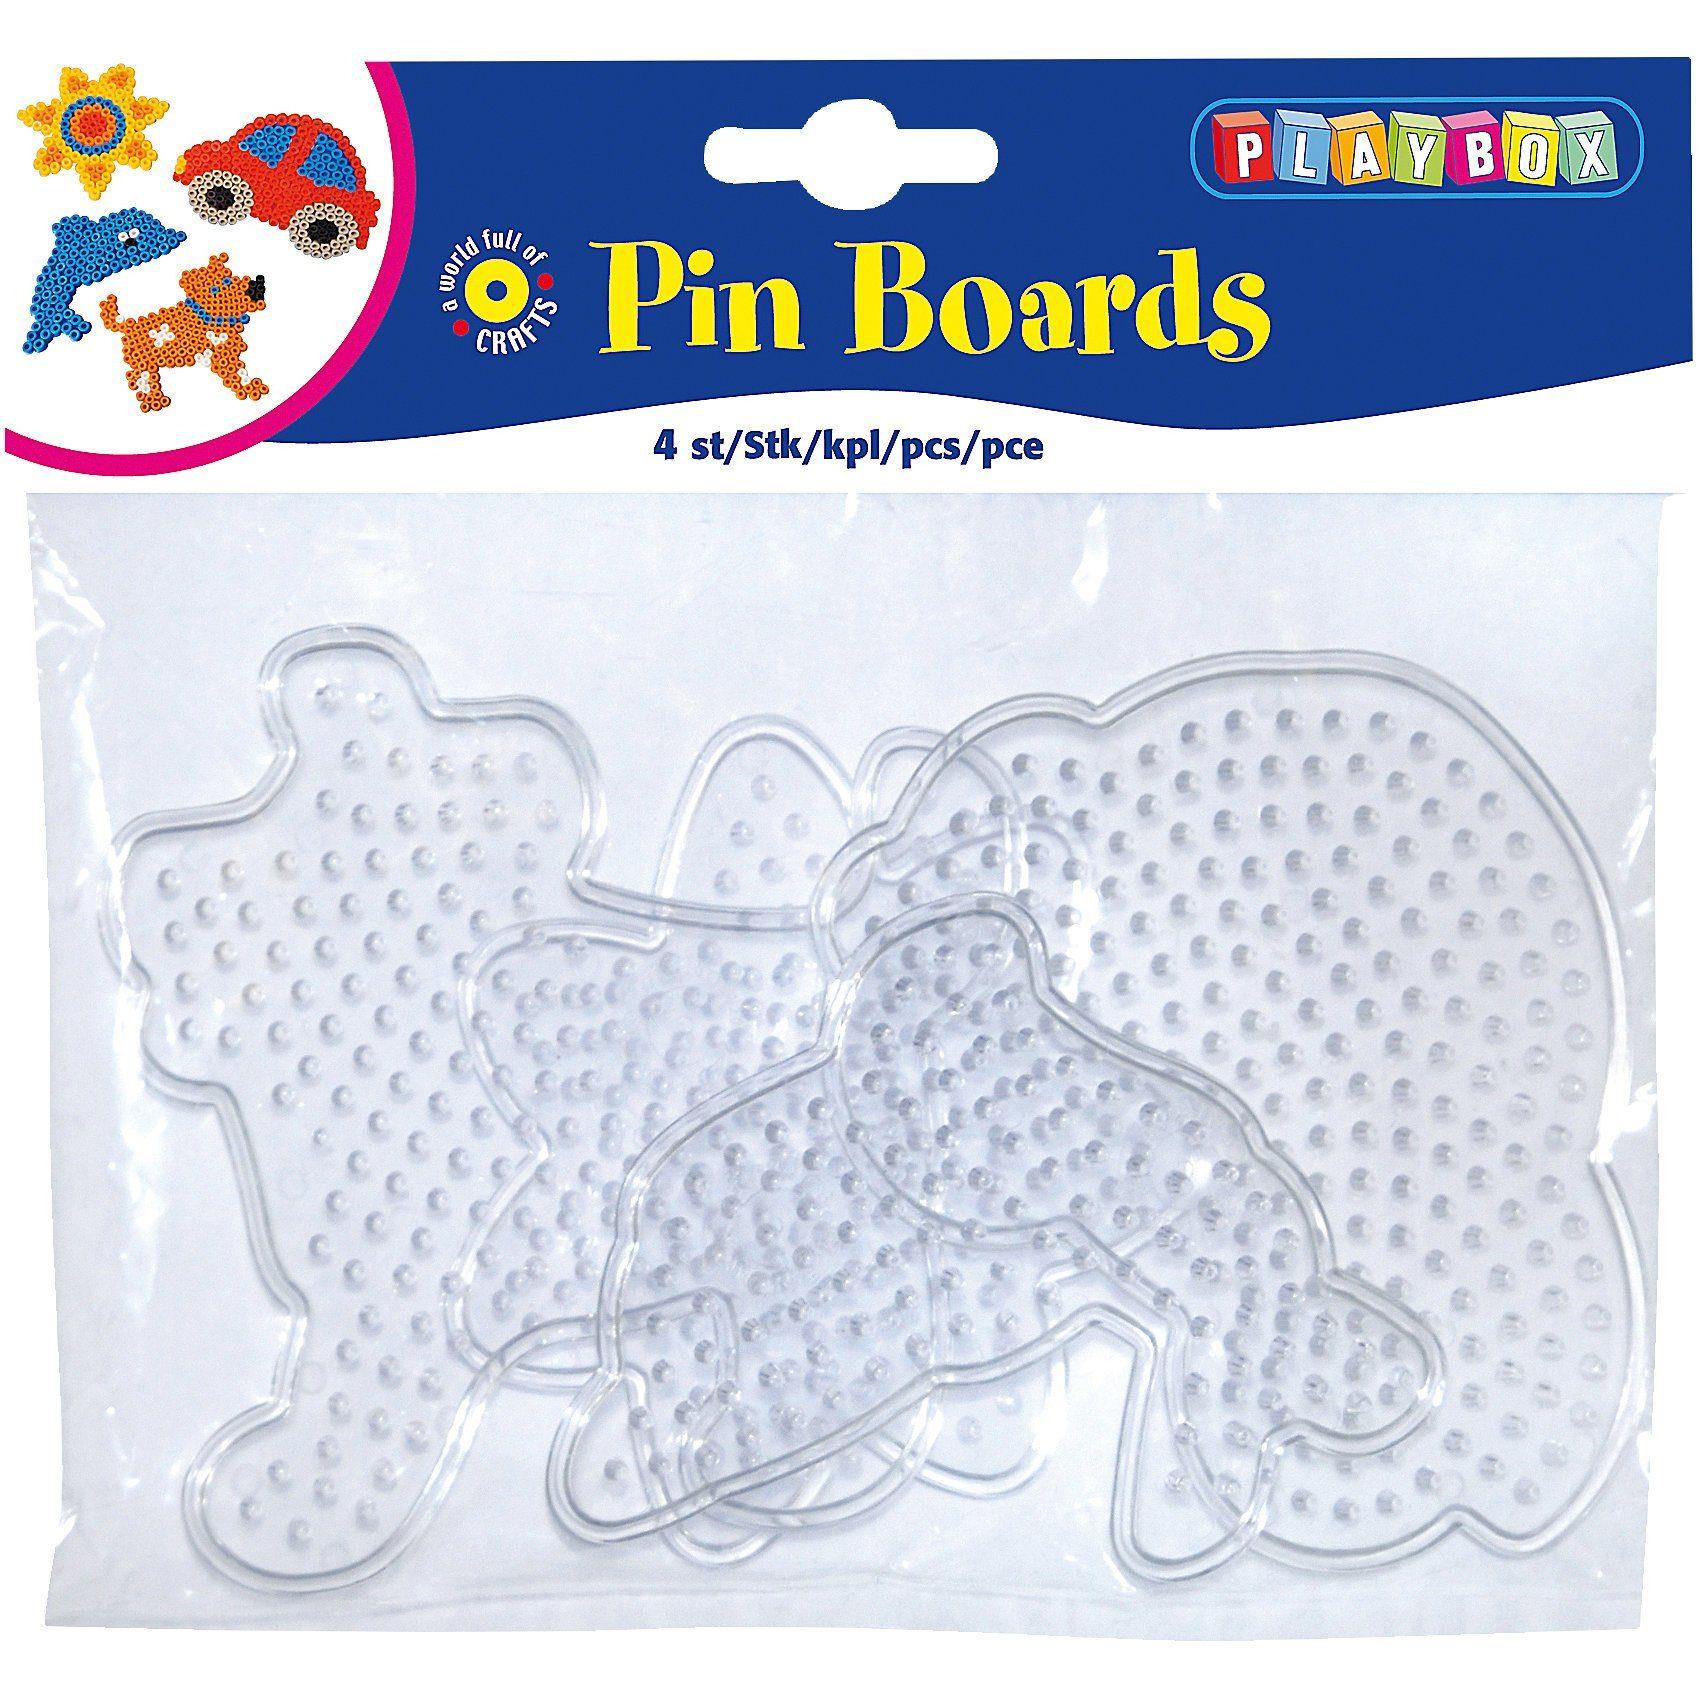 Playbox Bügelperlen Steckplatten, 4 Stück - Hund, Auto, Fisch, Blume